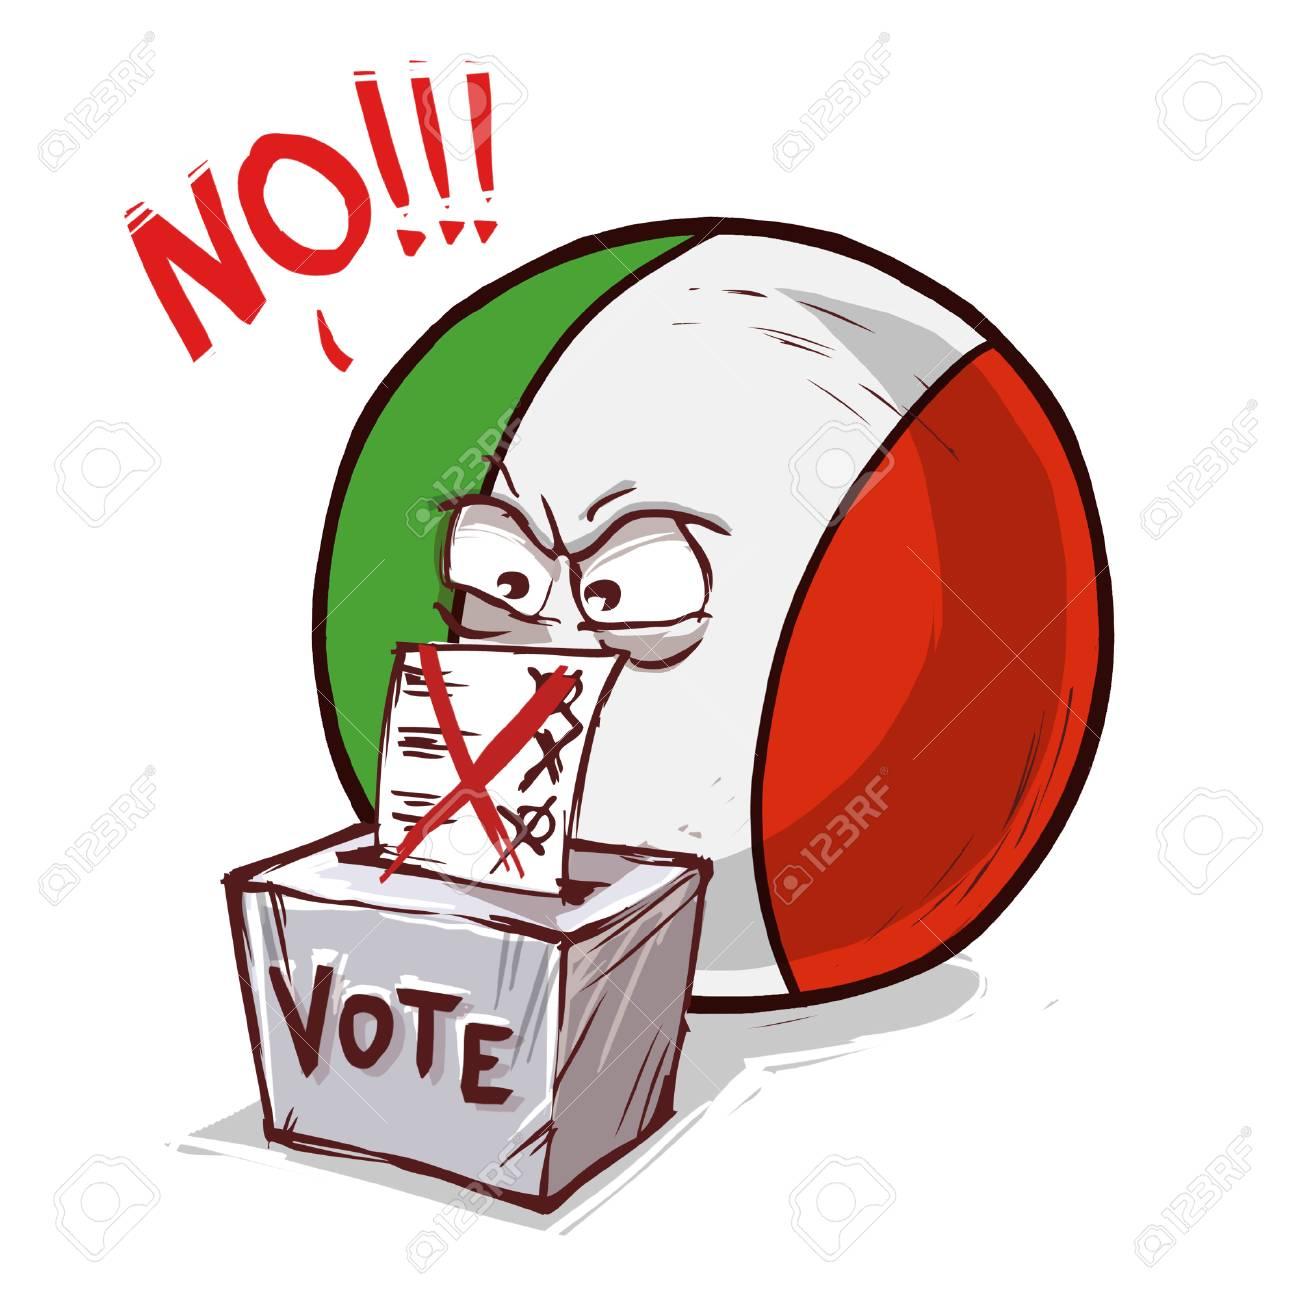 italy voting no - 105913377